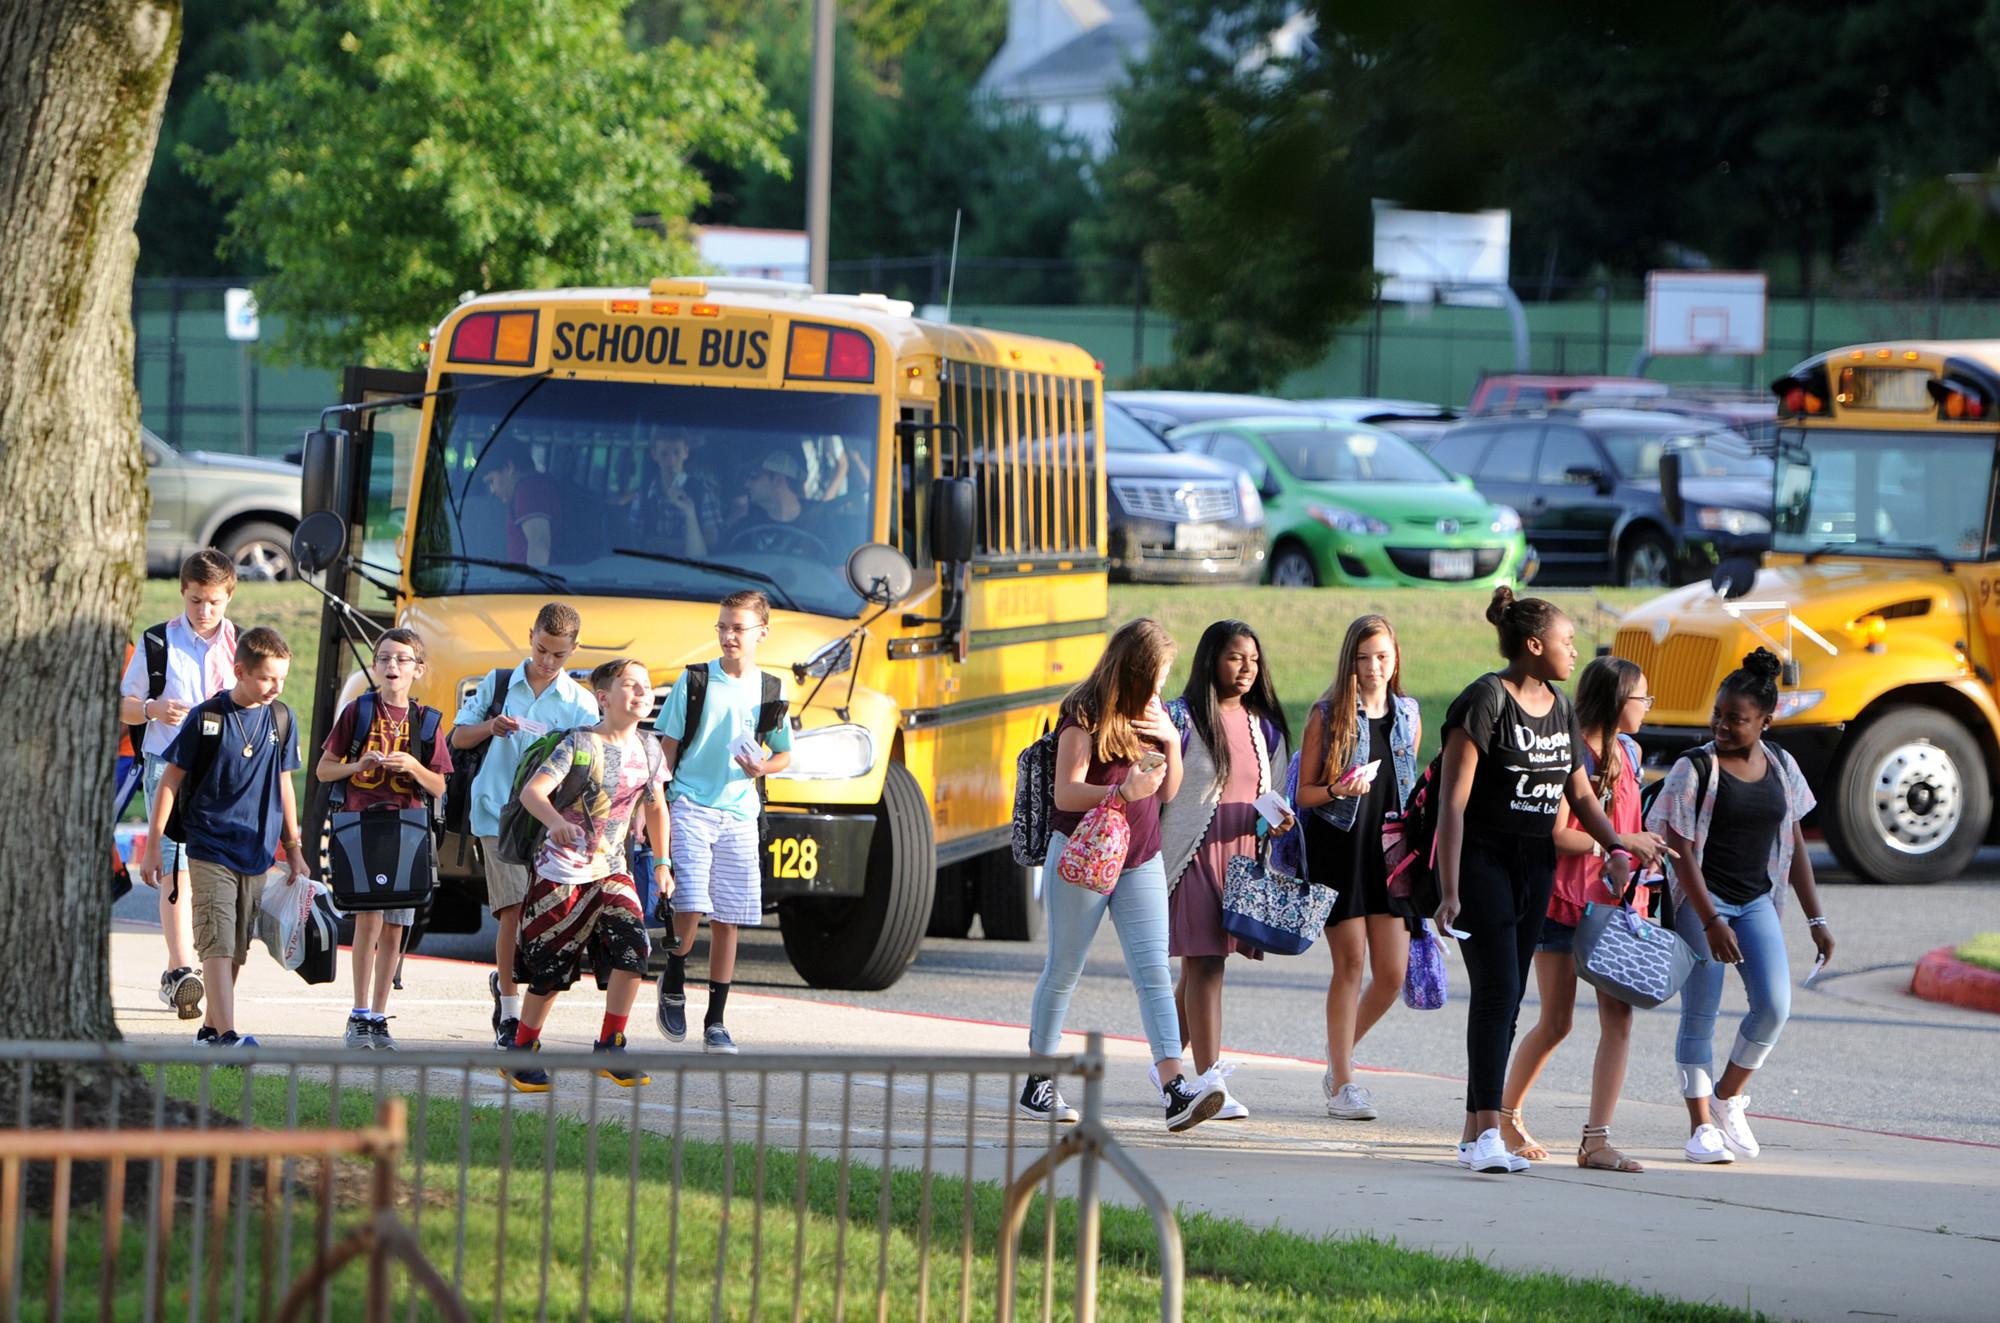 St. Elizabeth Ann Seton Catholic School in Wichita, KS   Dismissal From School